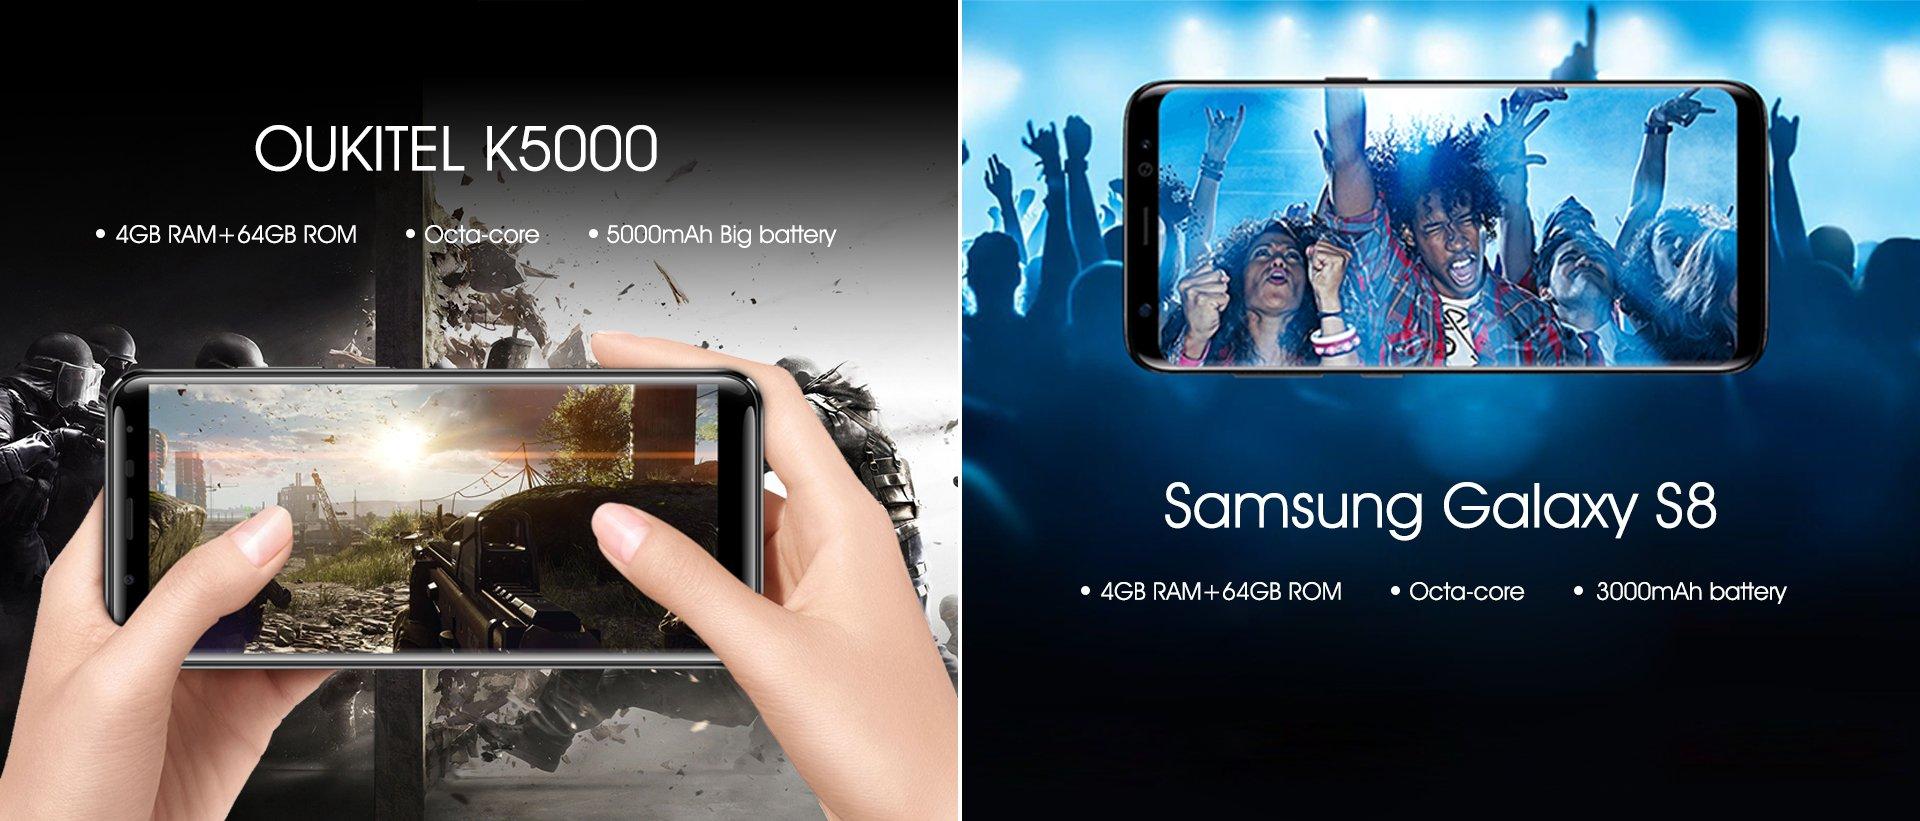 oukitel-k5000-vs-samsung-galaxy-s8-02